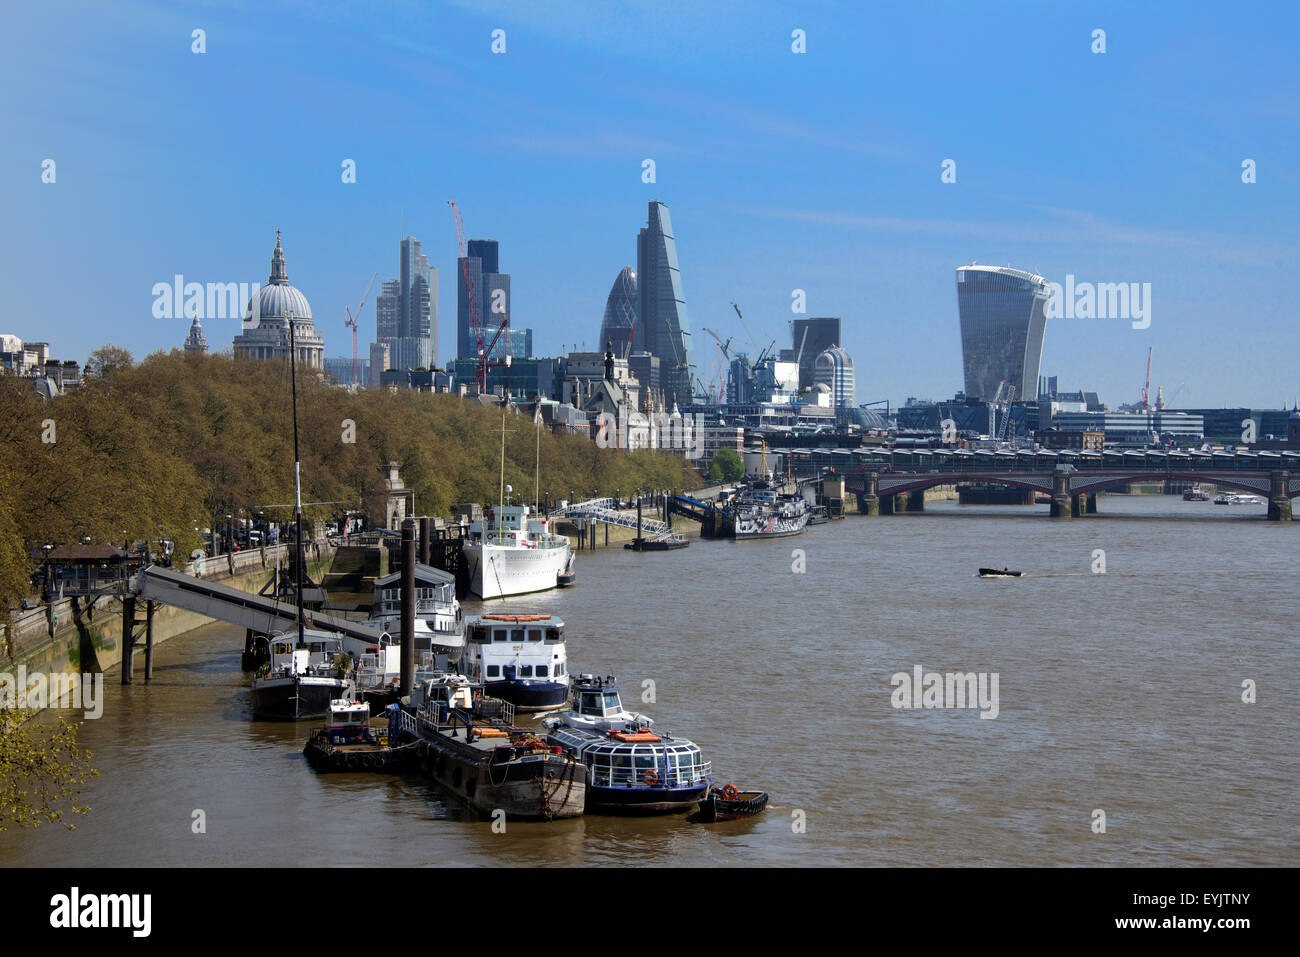 Victoria Embankment Thames and City of London skyline England - Stock Image